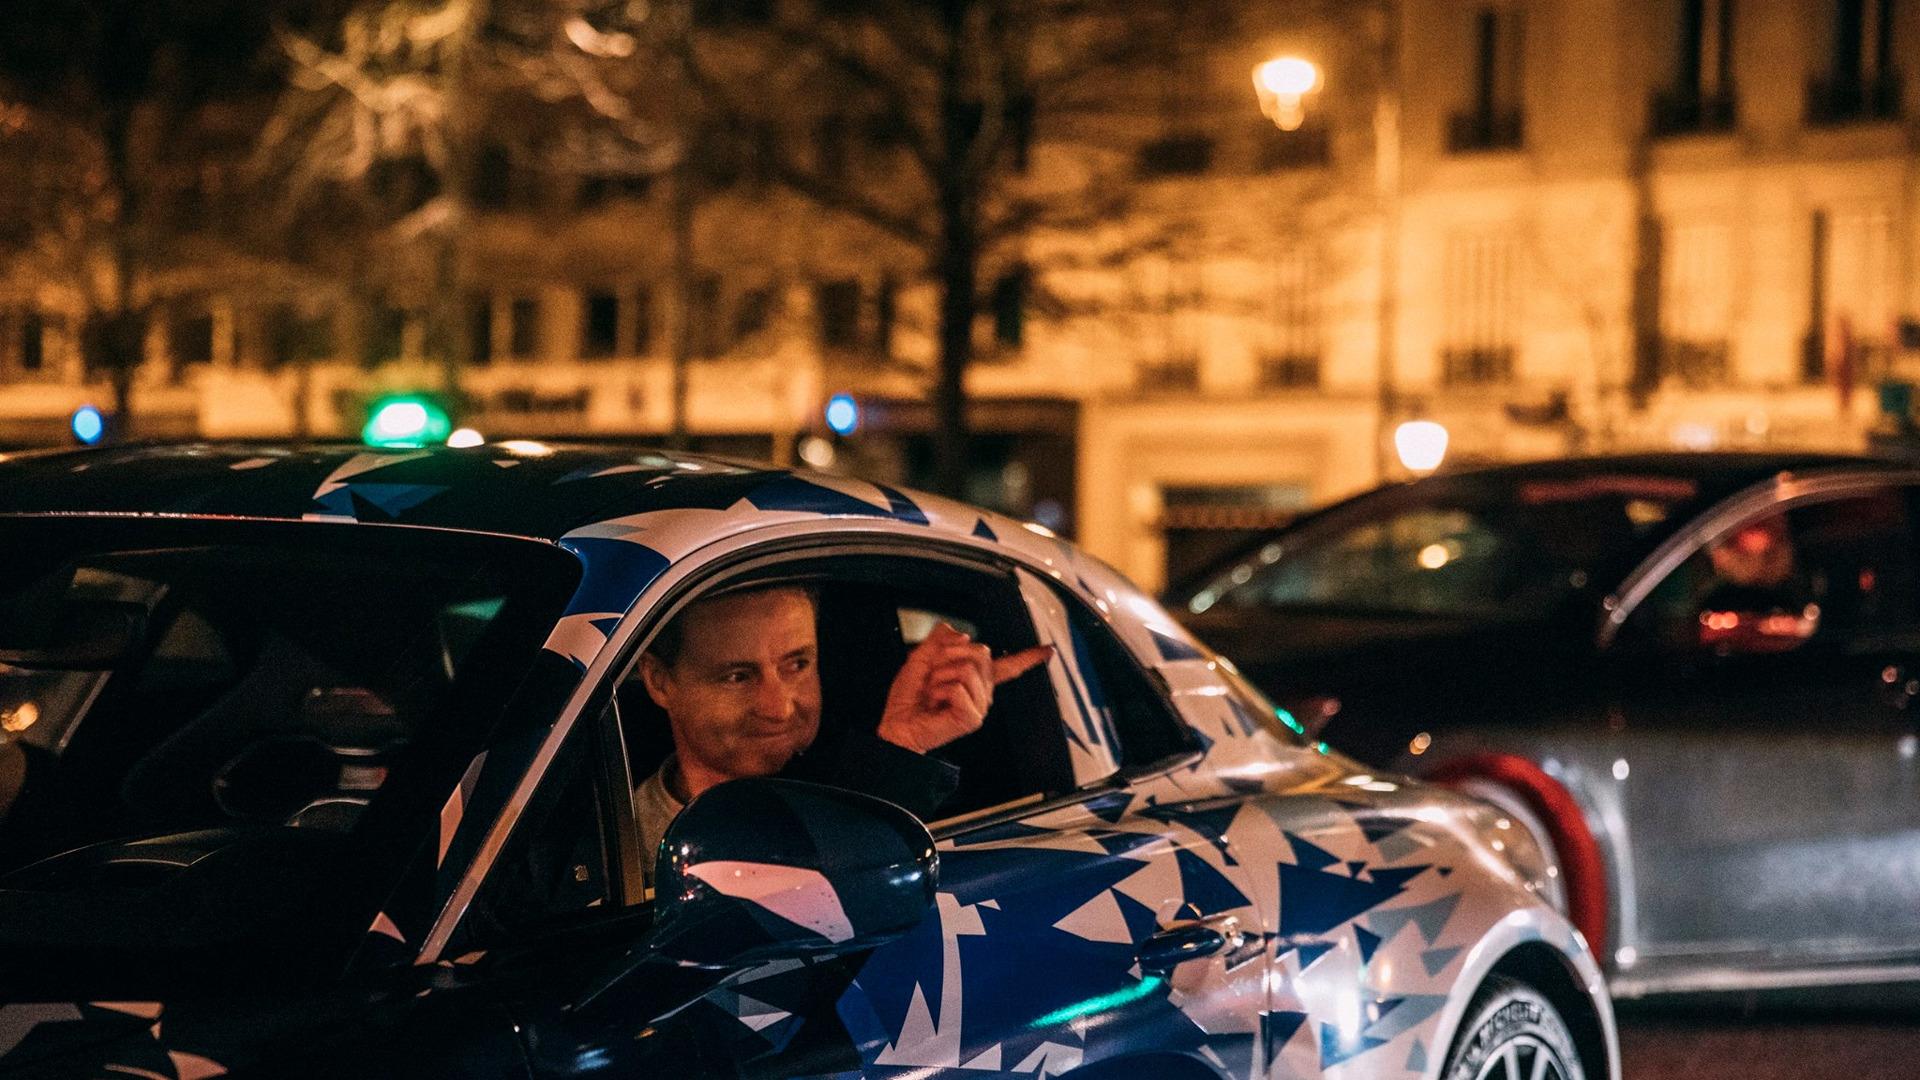 alpine-prototypes-paris-night-ride (26)